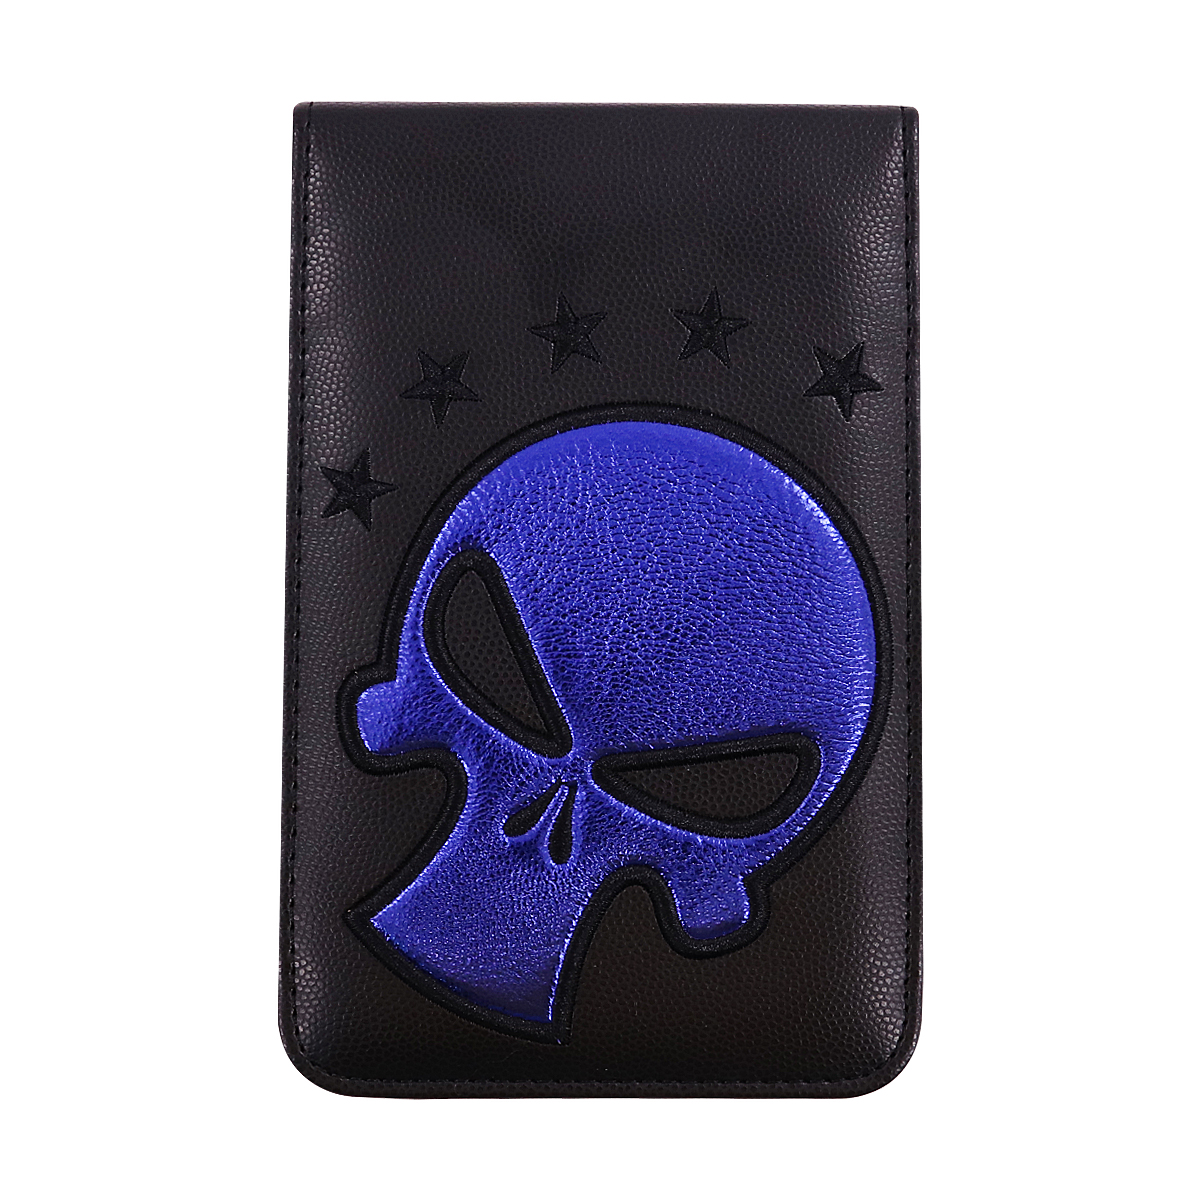 Craftsman Blue/Red Skull Leather Golf Scorecard / Yardage Book Holder Cover 6.3